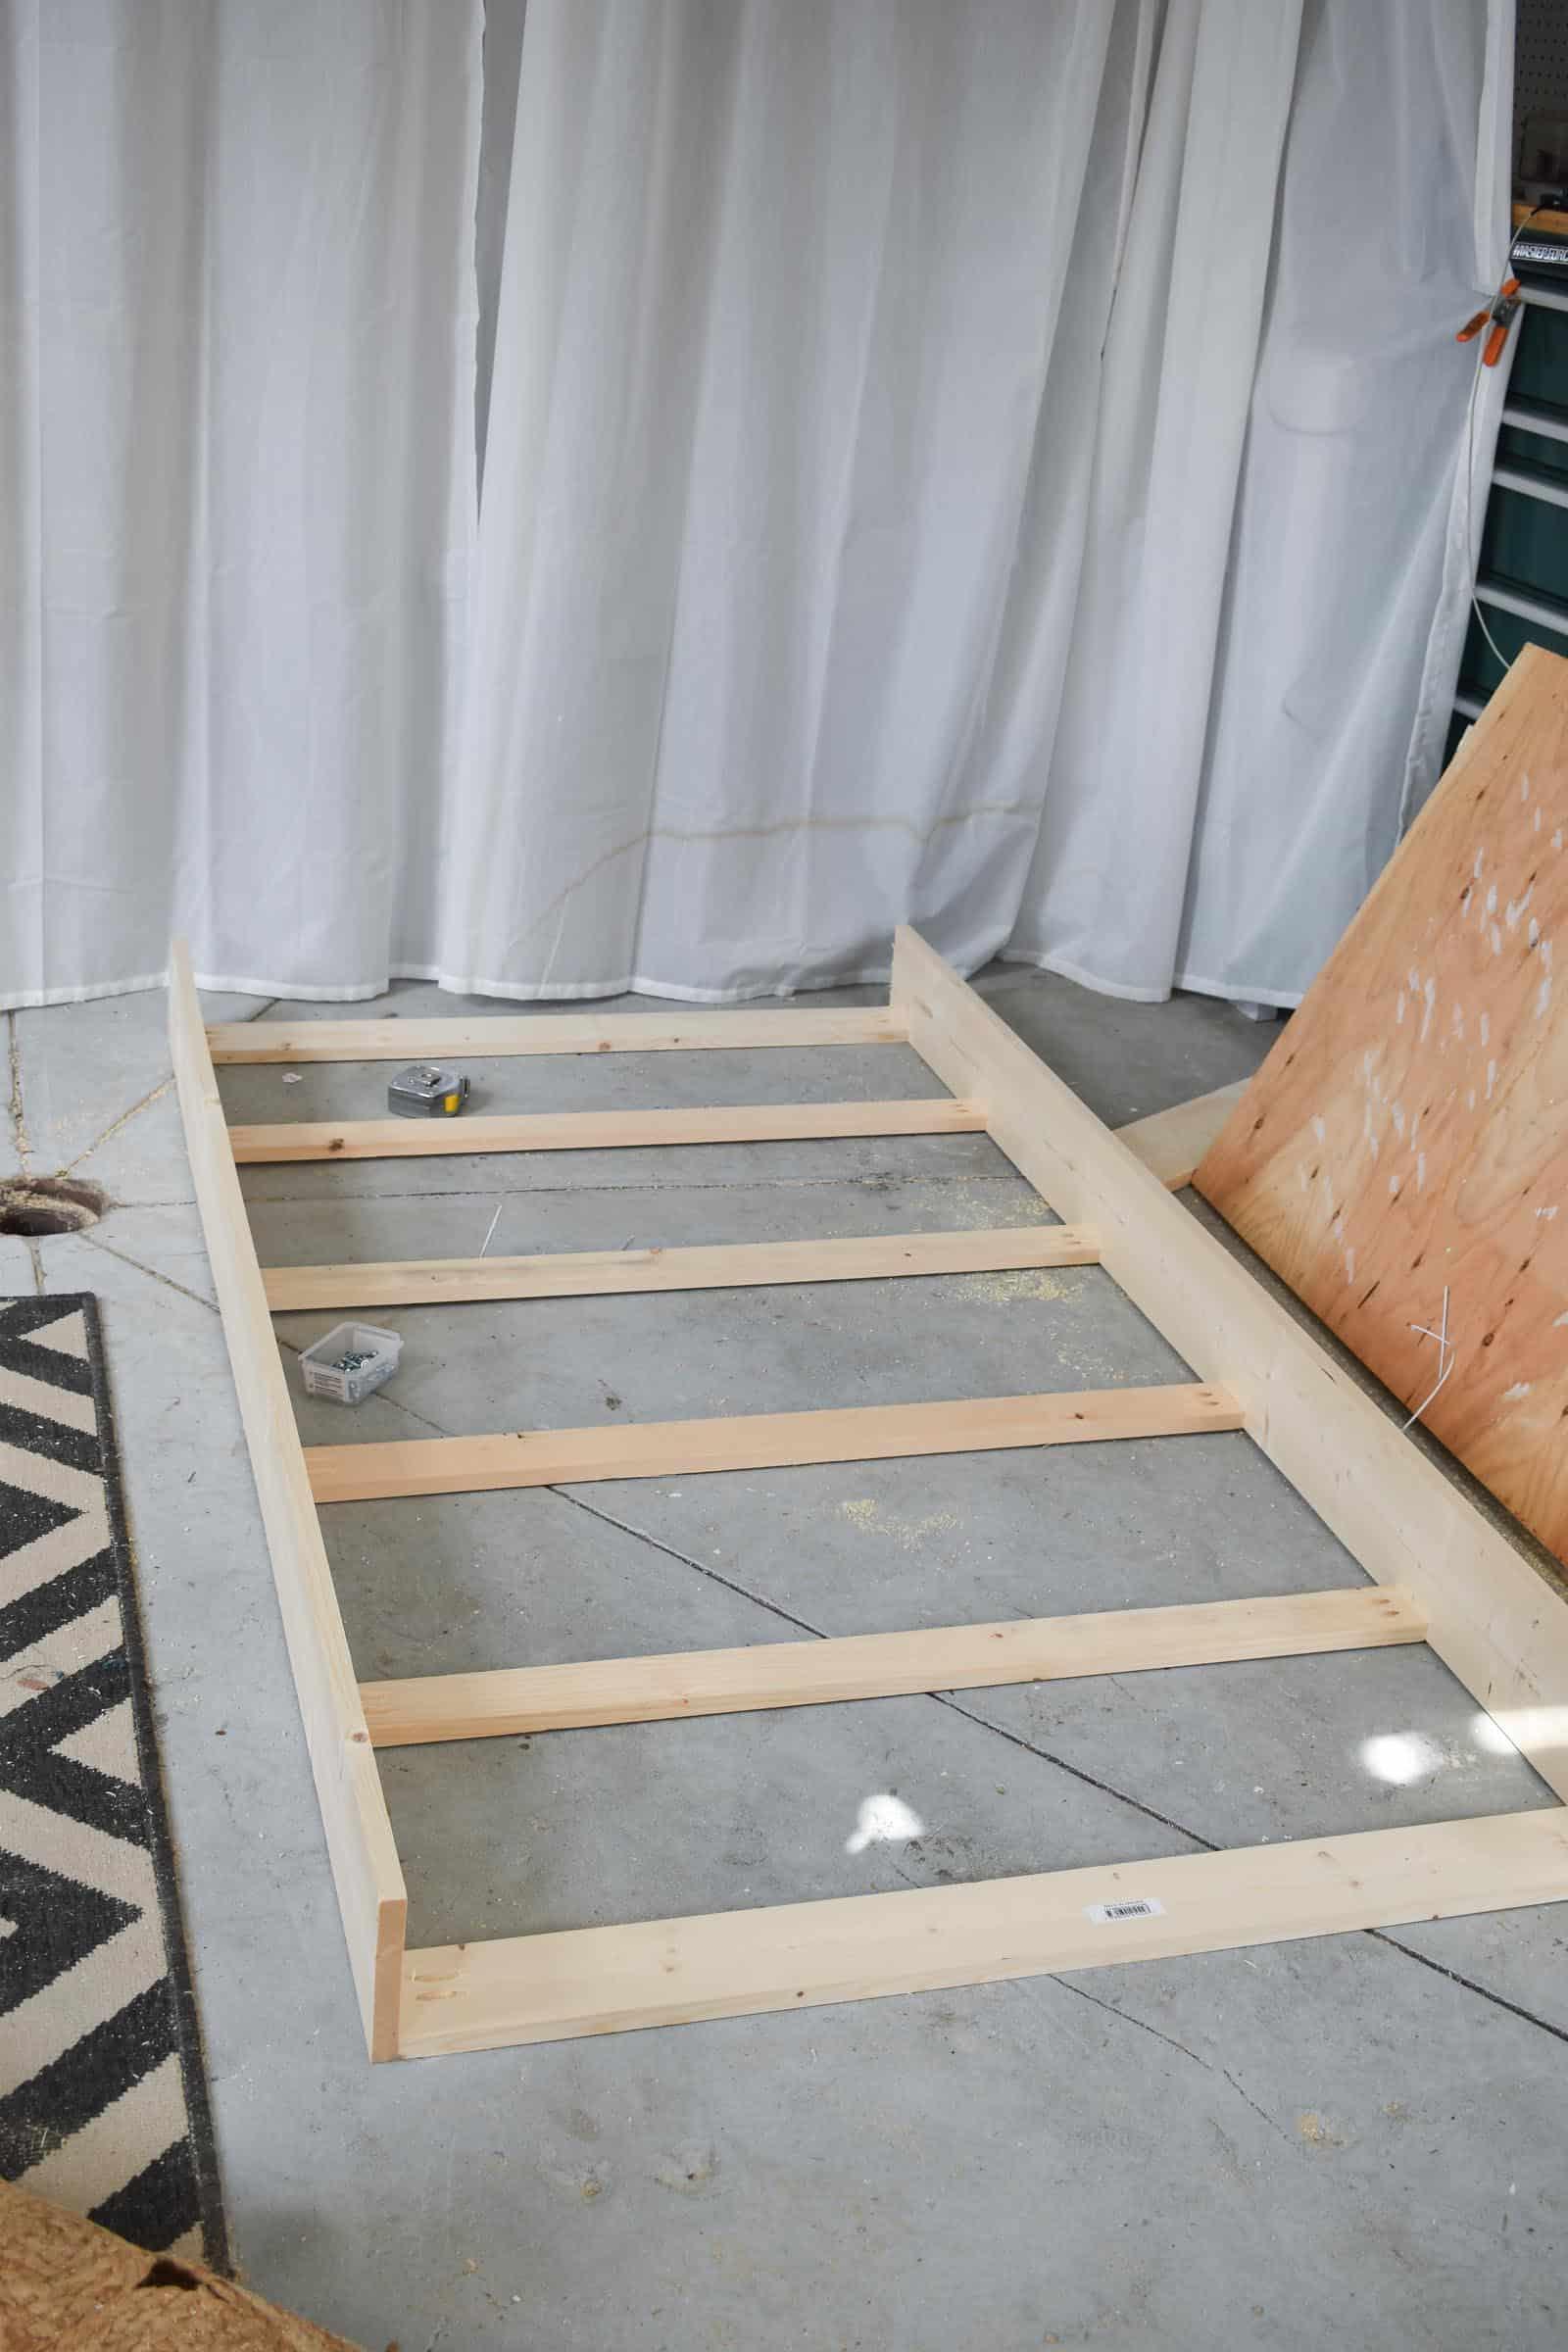 preliminary bed frame